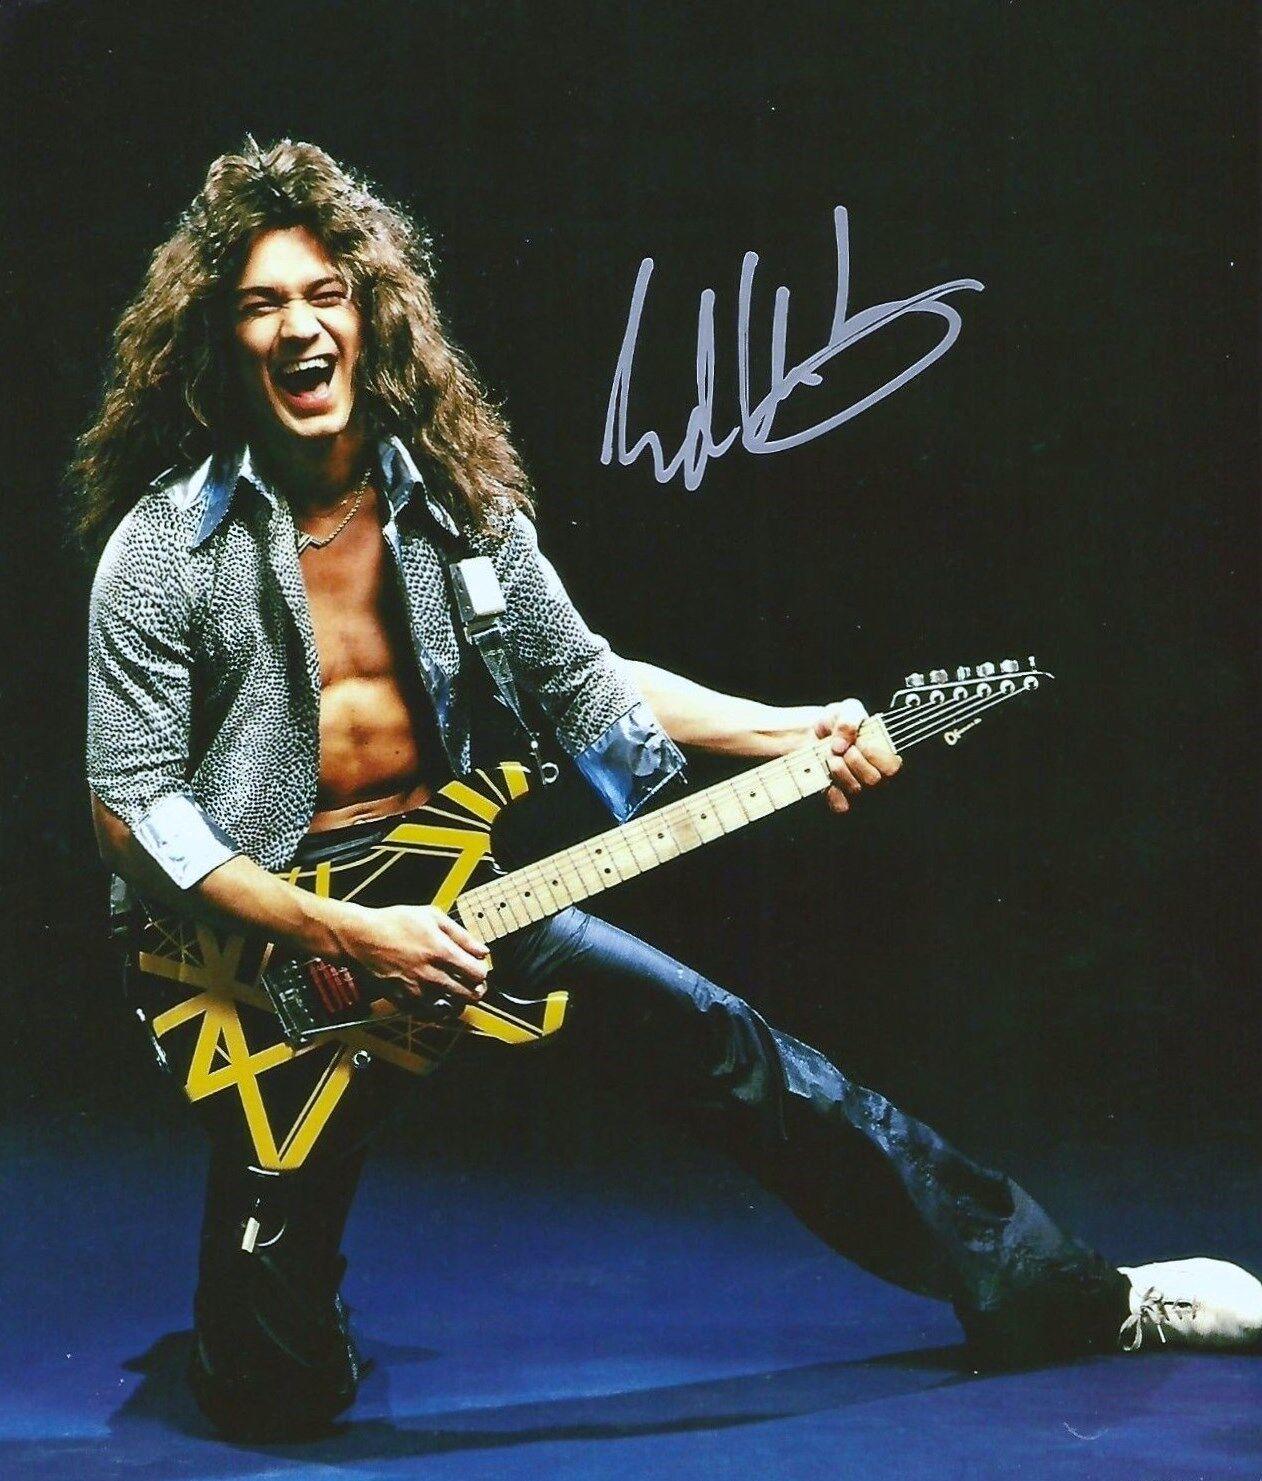 Read This: The photo shoot that drove Van Halen apart - The AV Club Eddie van halen photos recent